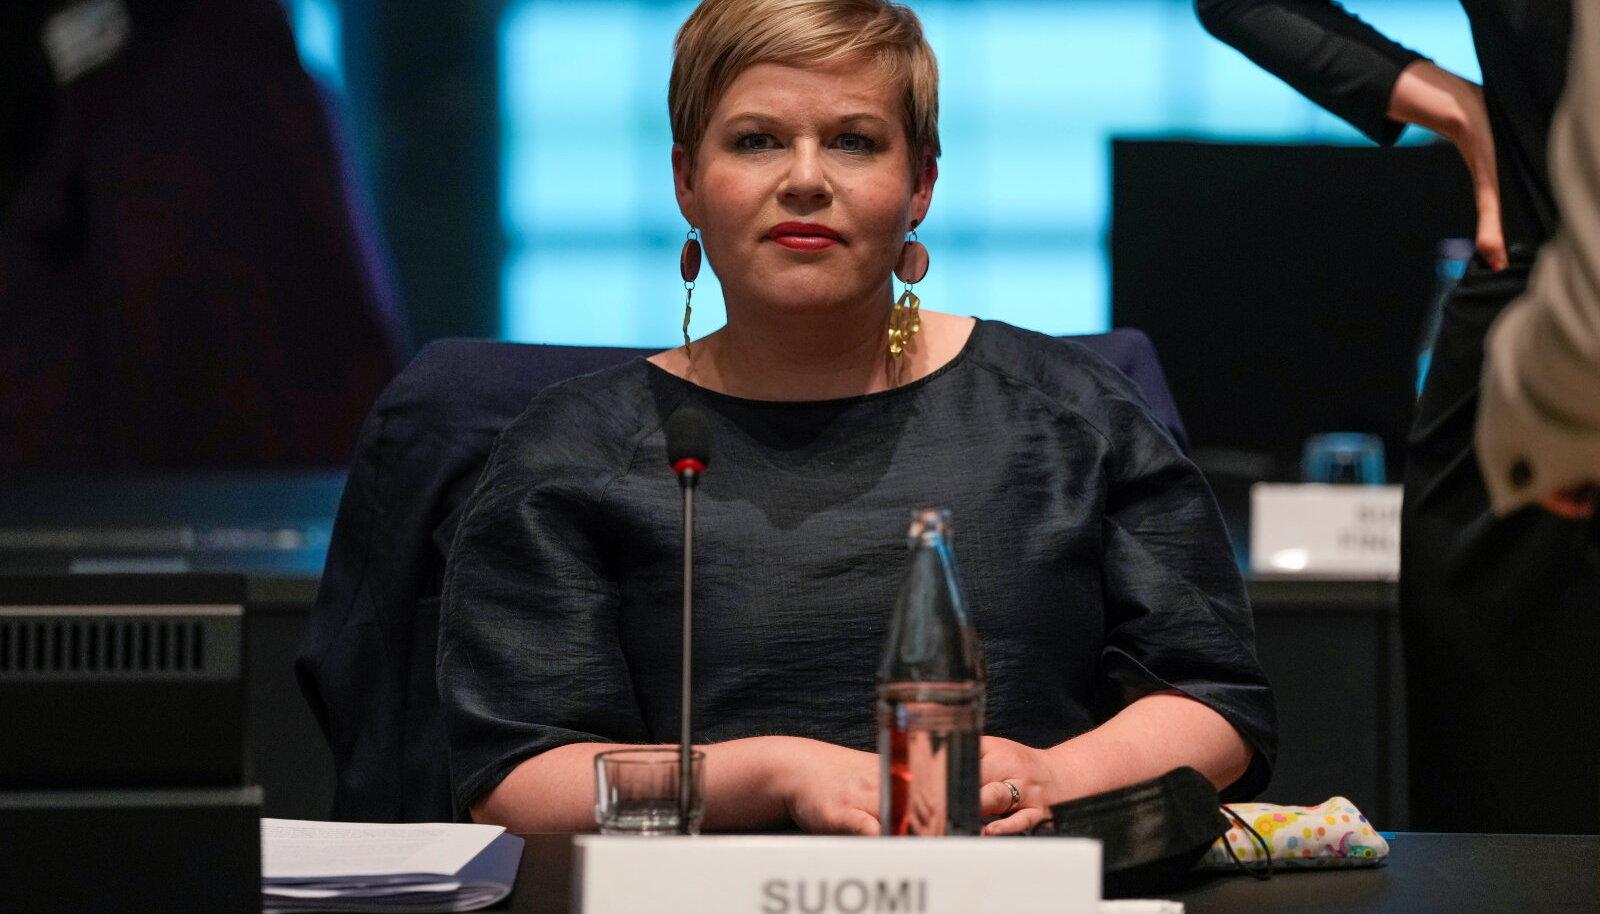 Soome rahandusminister Annika Saarikko